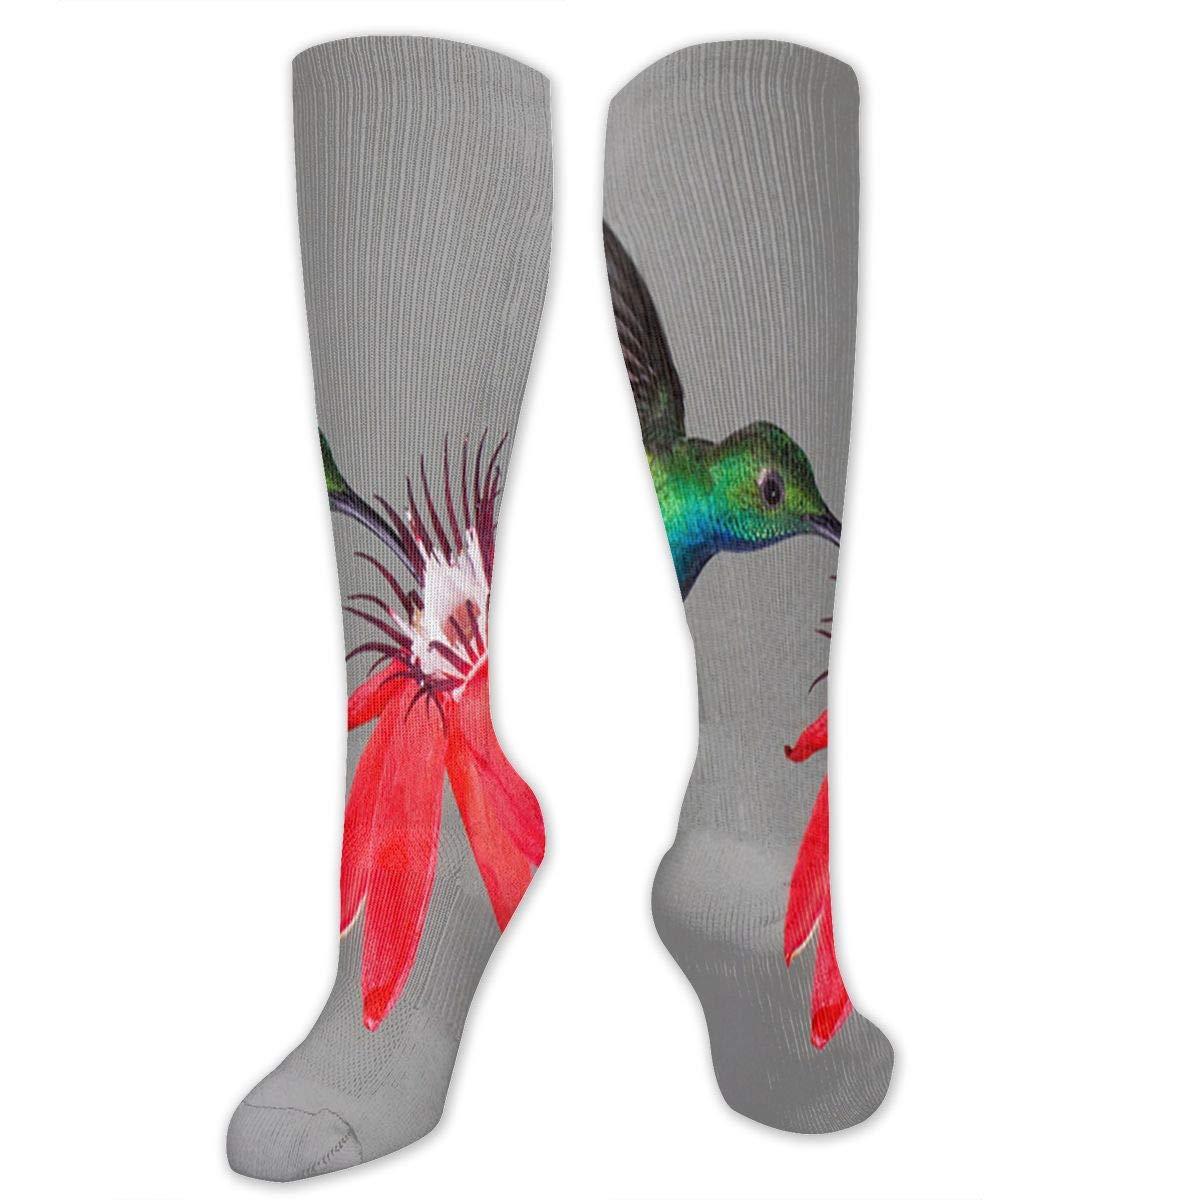 Stretch Socks Hummingbird Adn Red Flower Fantastic Winter Warmth for Women /& Men Athletic Sports